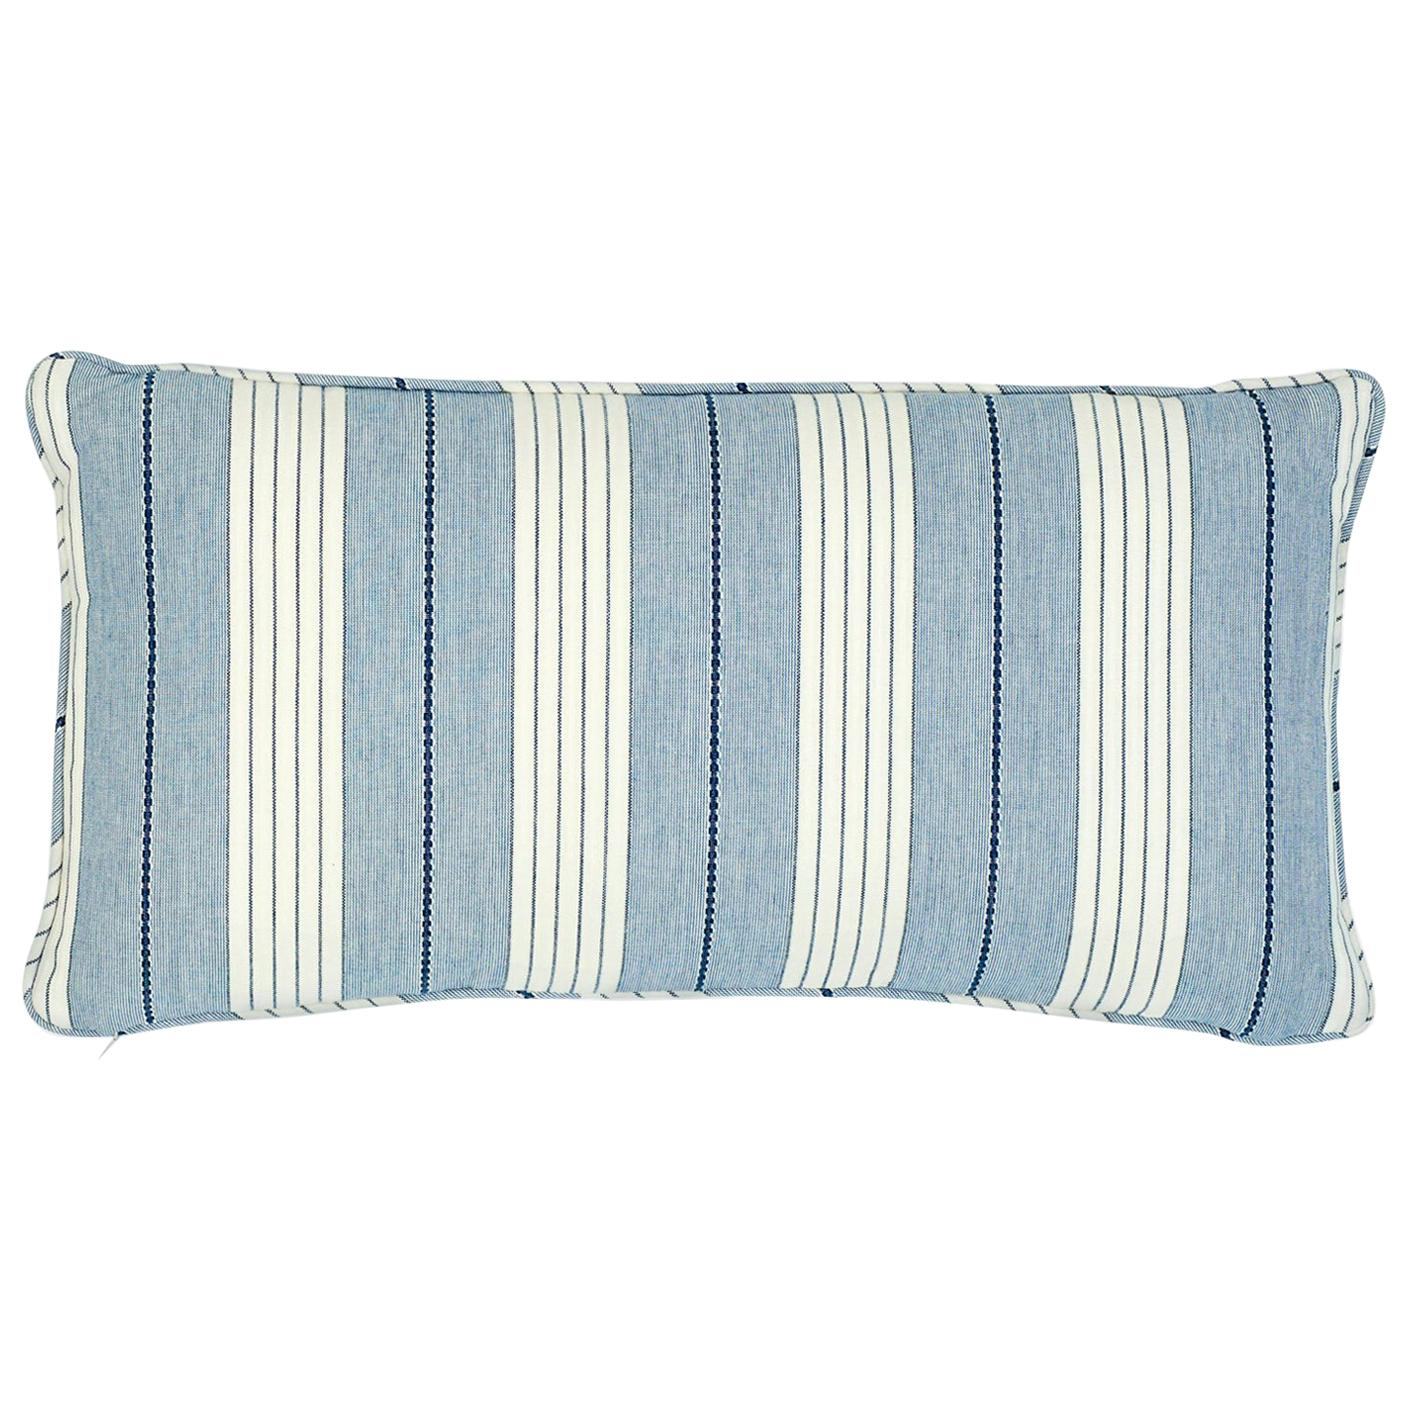 Schumacher Audrey Stripe Navy Two-Sided Cotton Pillow